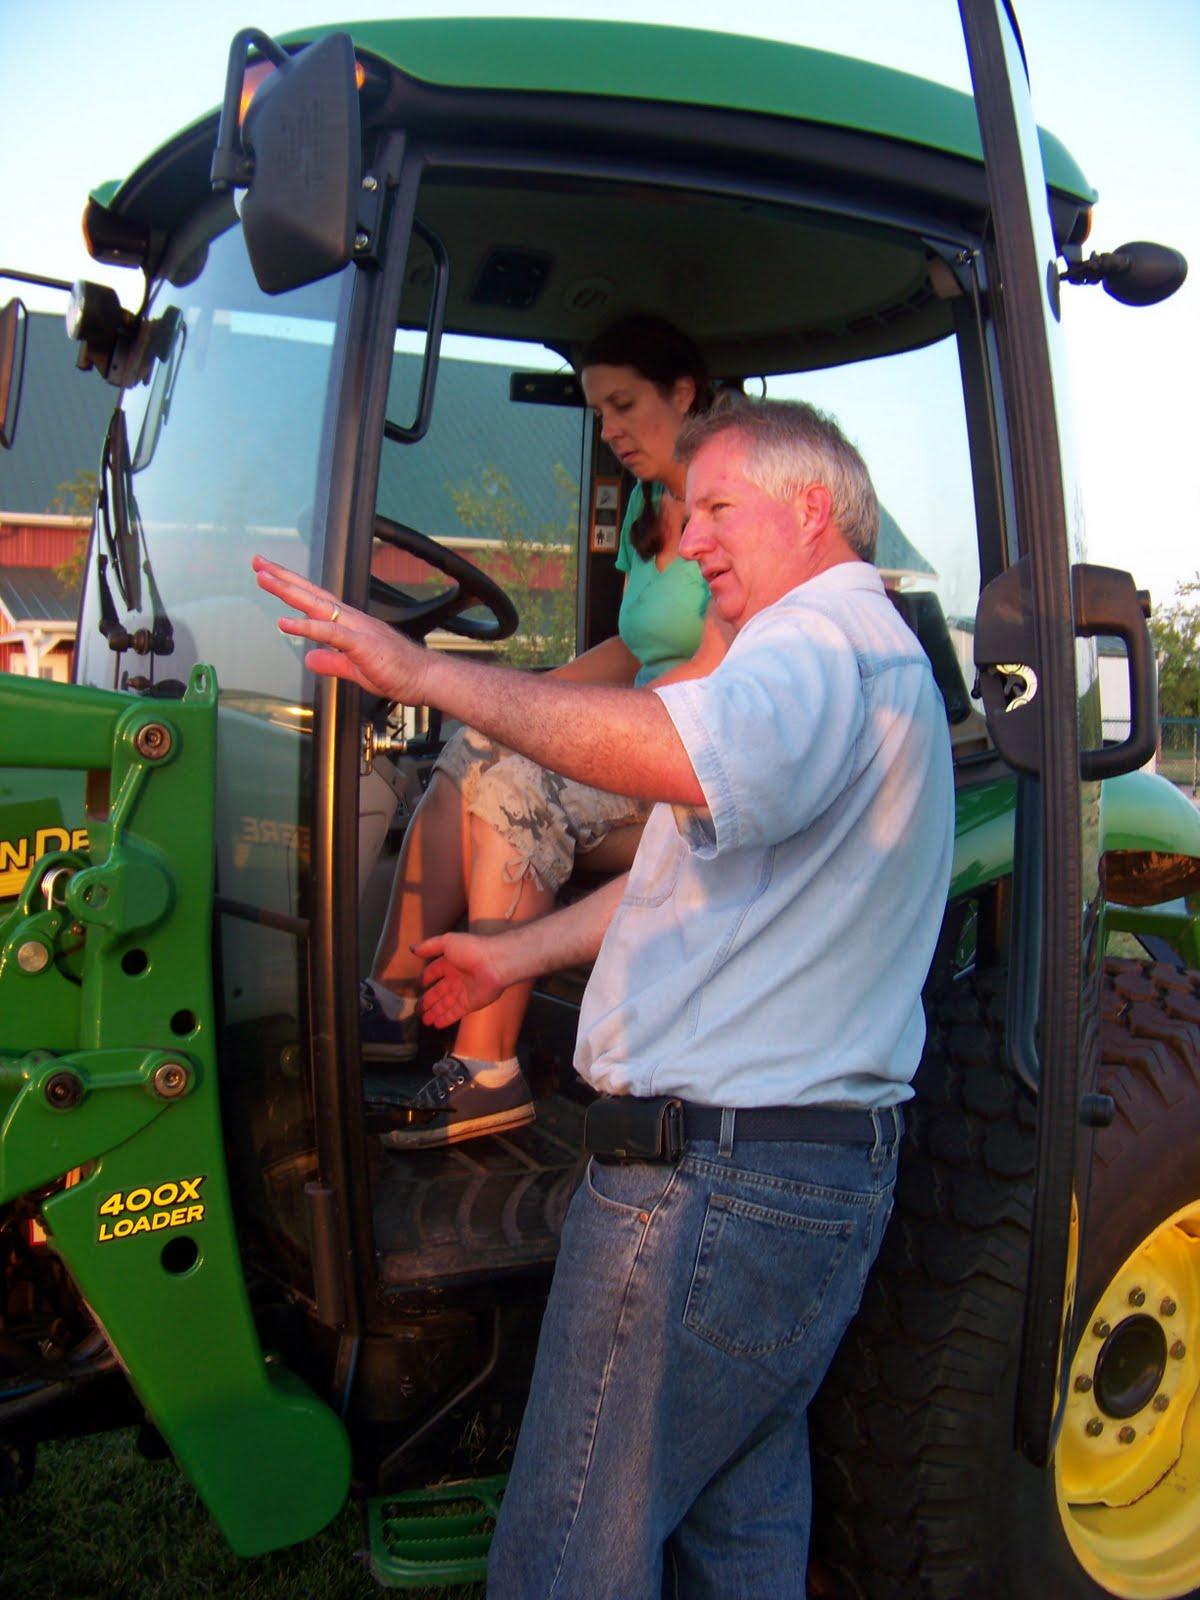 http://3.bp.blogspot.com/_Vx2FmMKE9w4/TECQ-Mvk2hI/AAAAAAAAAPg/MhDdo5jOt3o/s1600/Tractors+101+Workshop+056.JPG